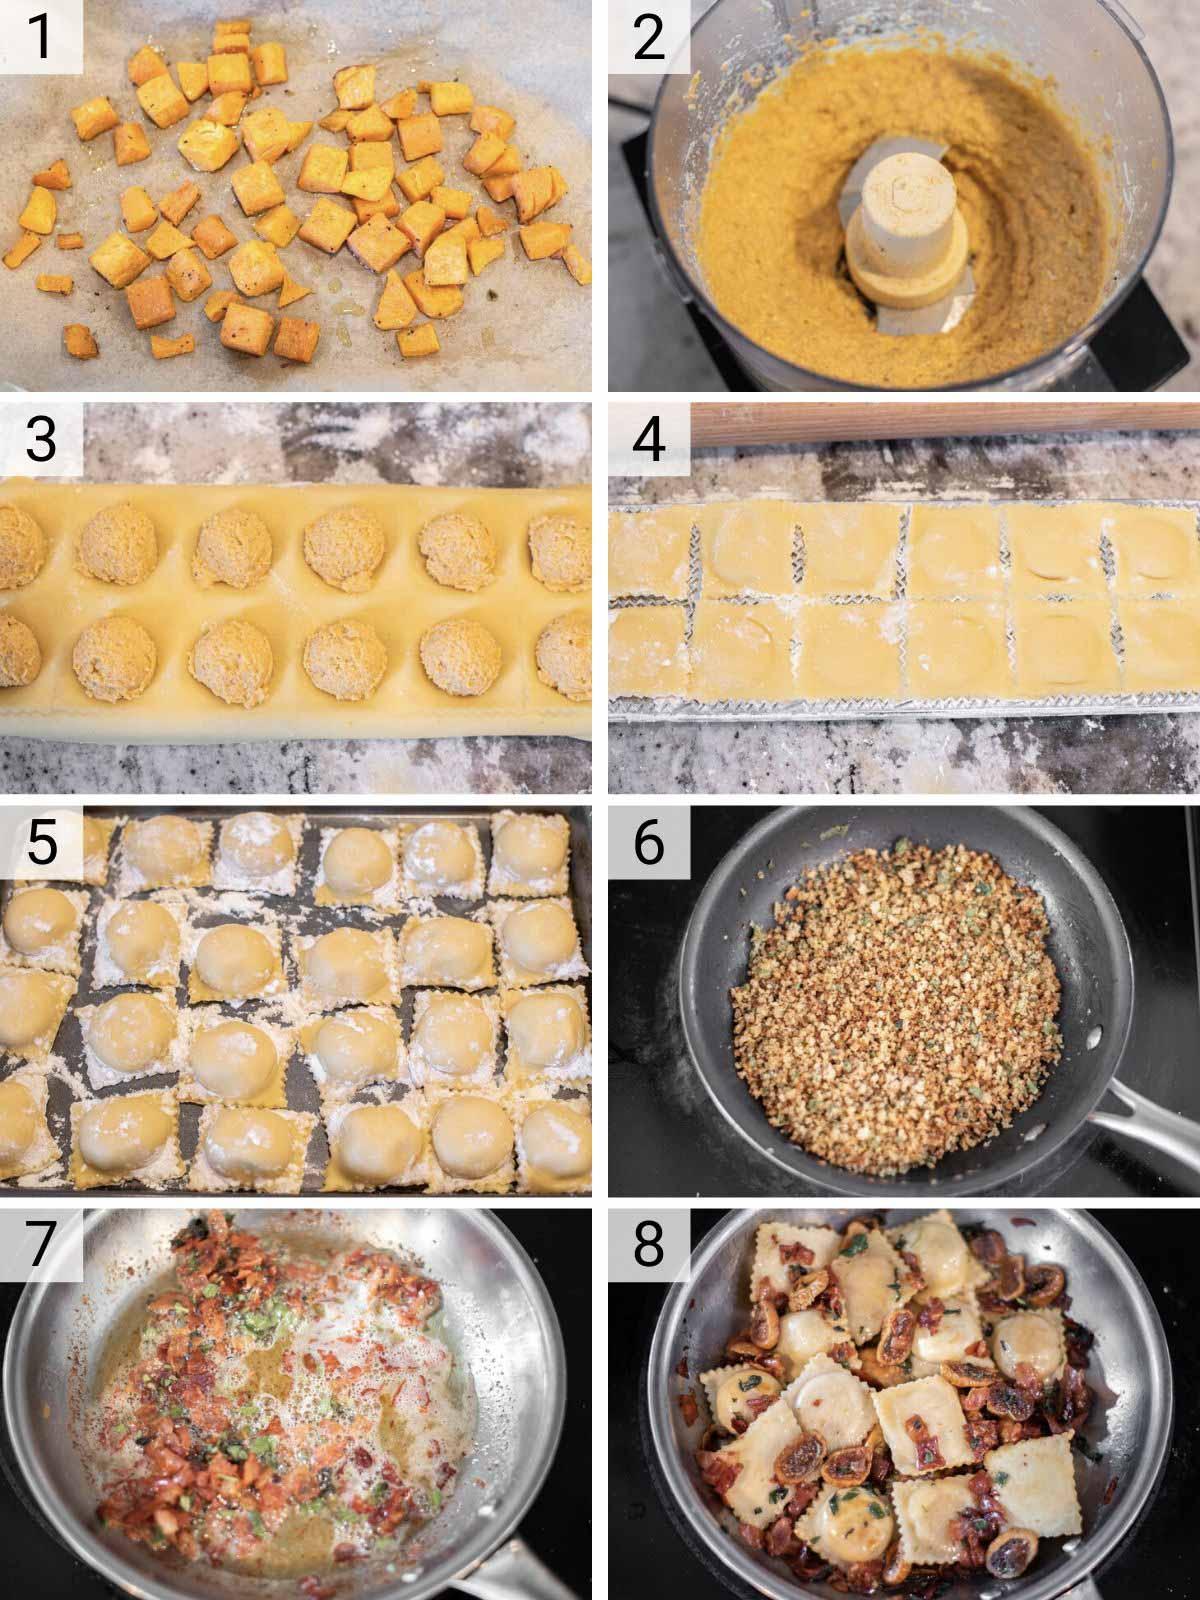 process shots of how to make butternut squash ravioli